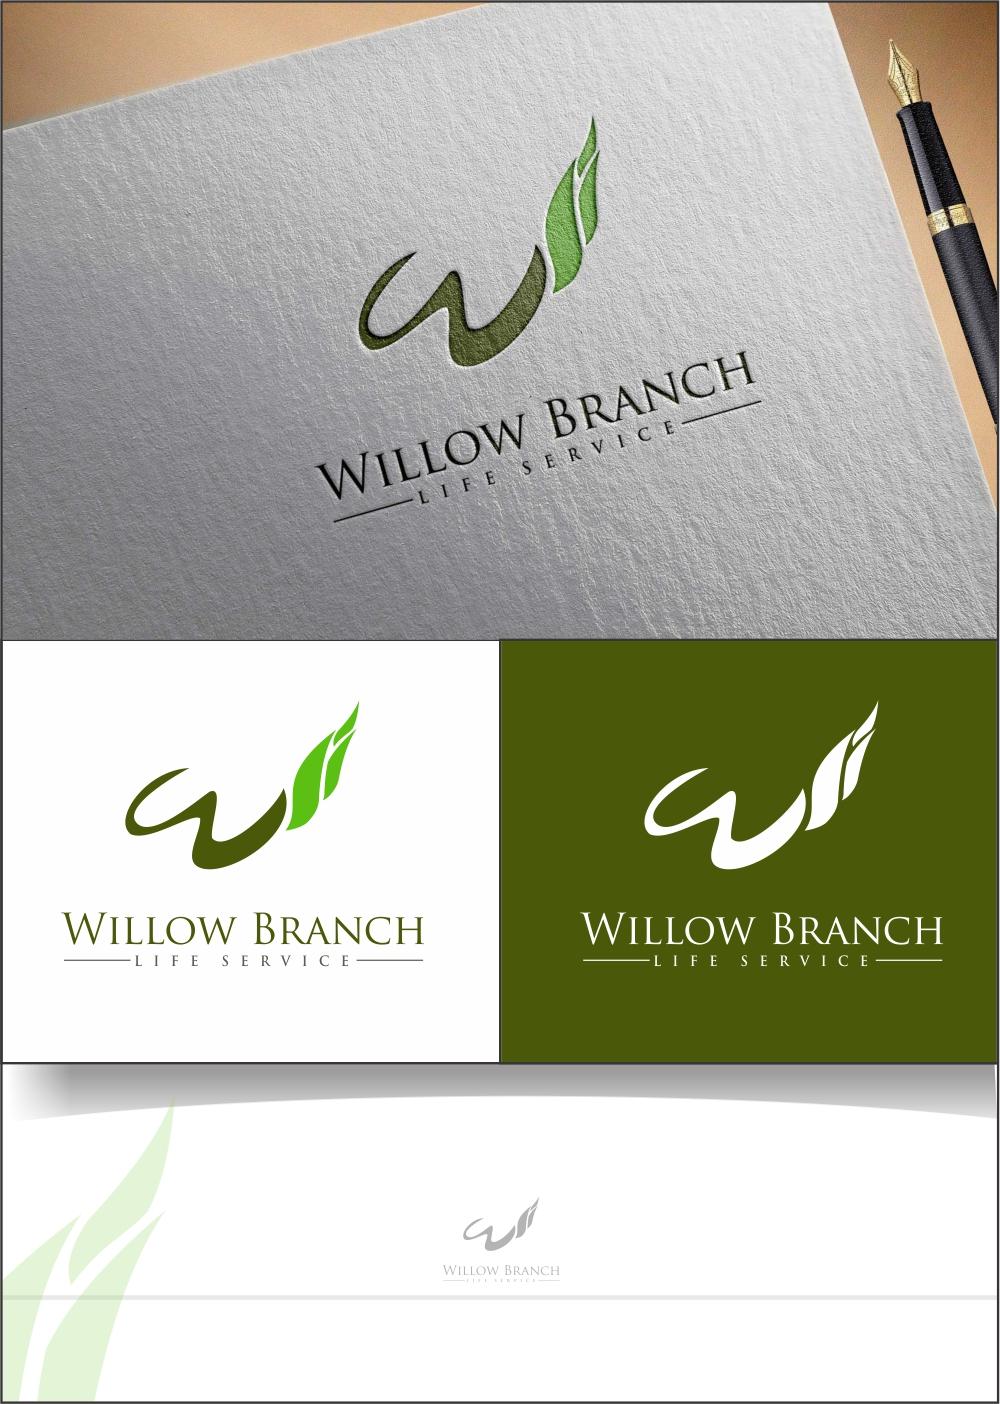 Logo Design by ian69 - Entry No. 121 in the Logo Design Contest Artistic Logo Design for Willow Branch Life Service.